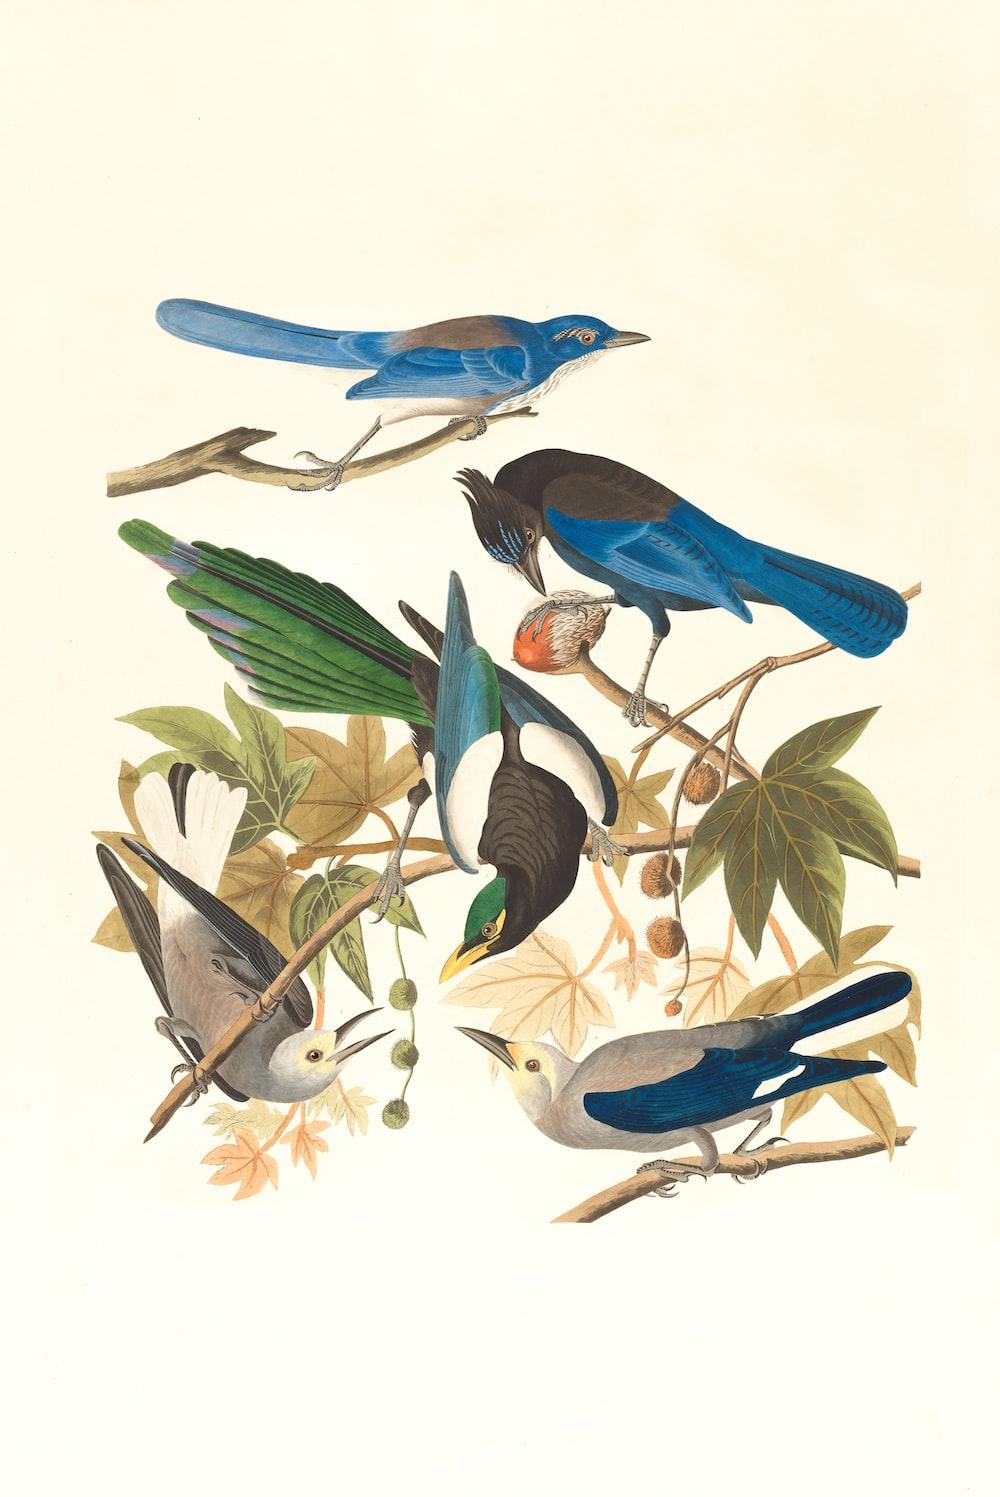 blue and black bird on tree branch